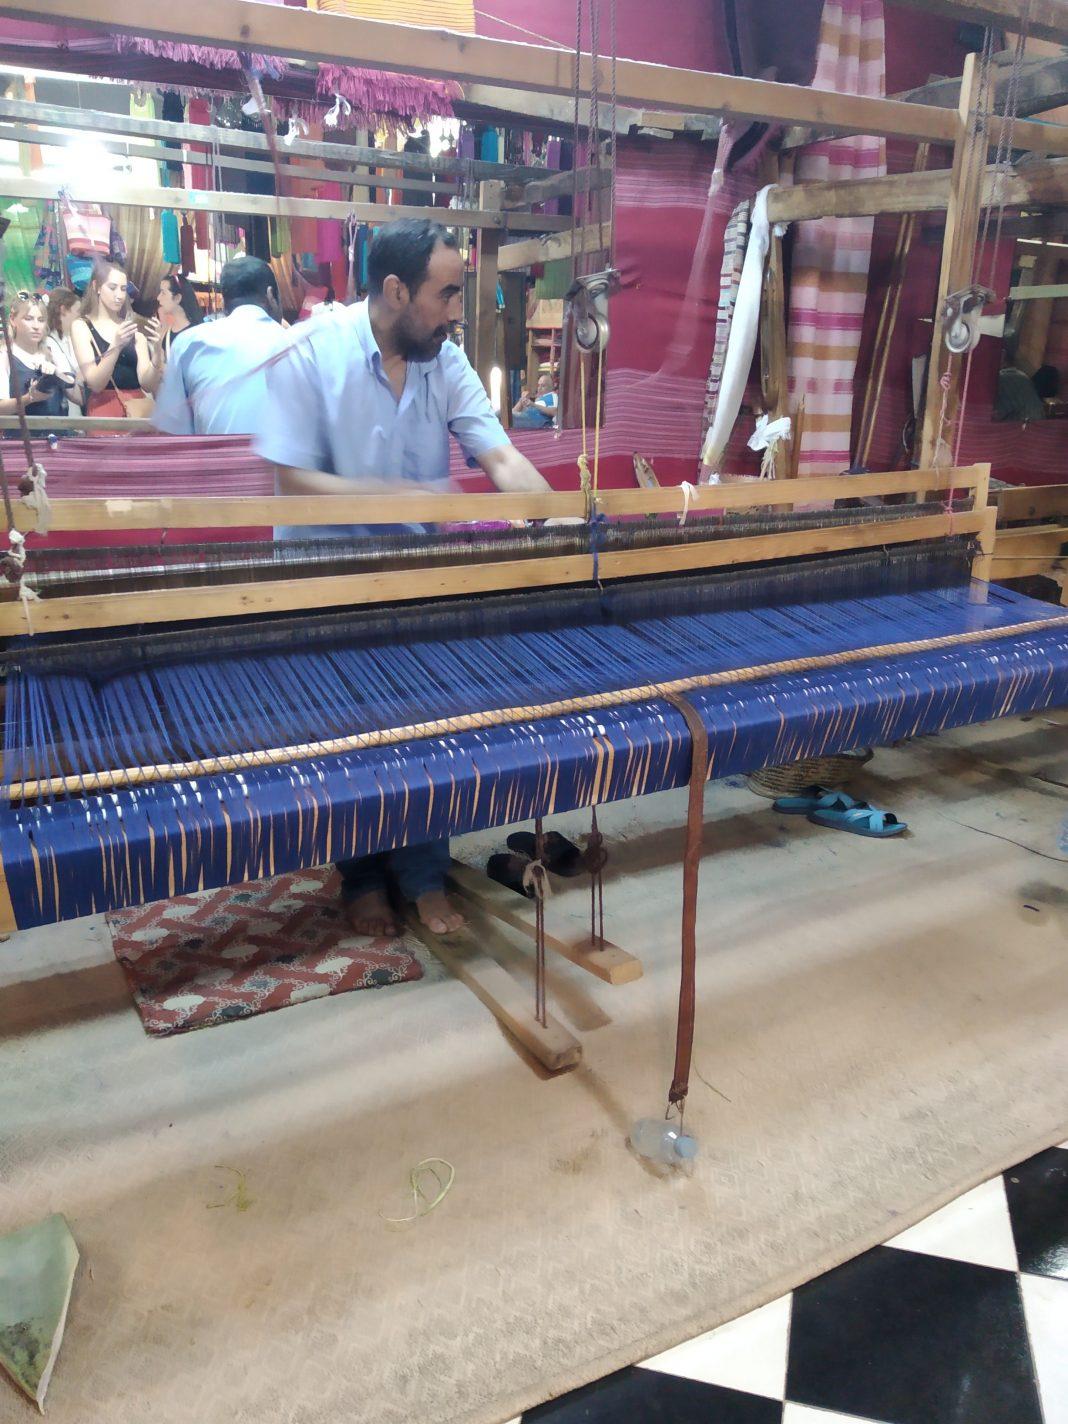 Het weven van kleding - Fes in Marokko